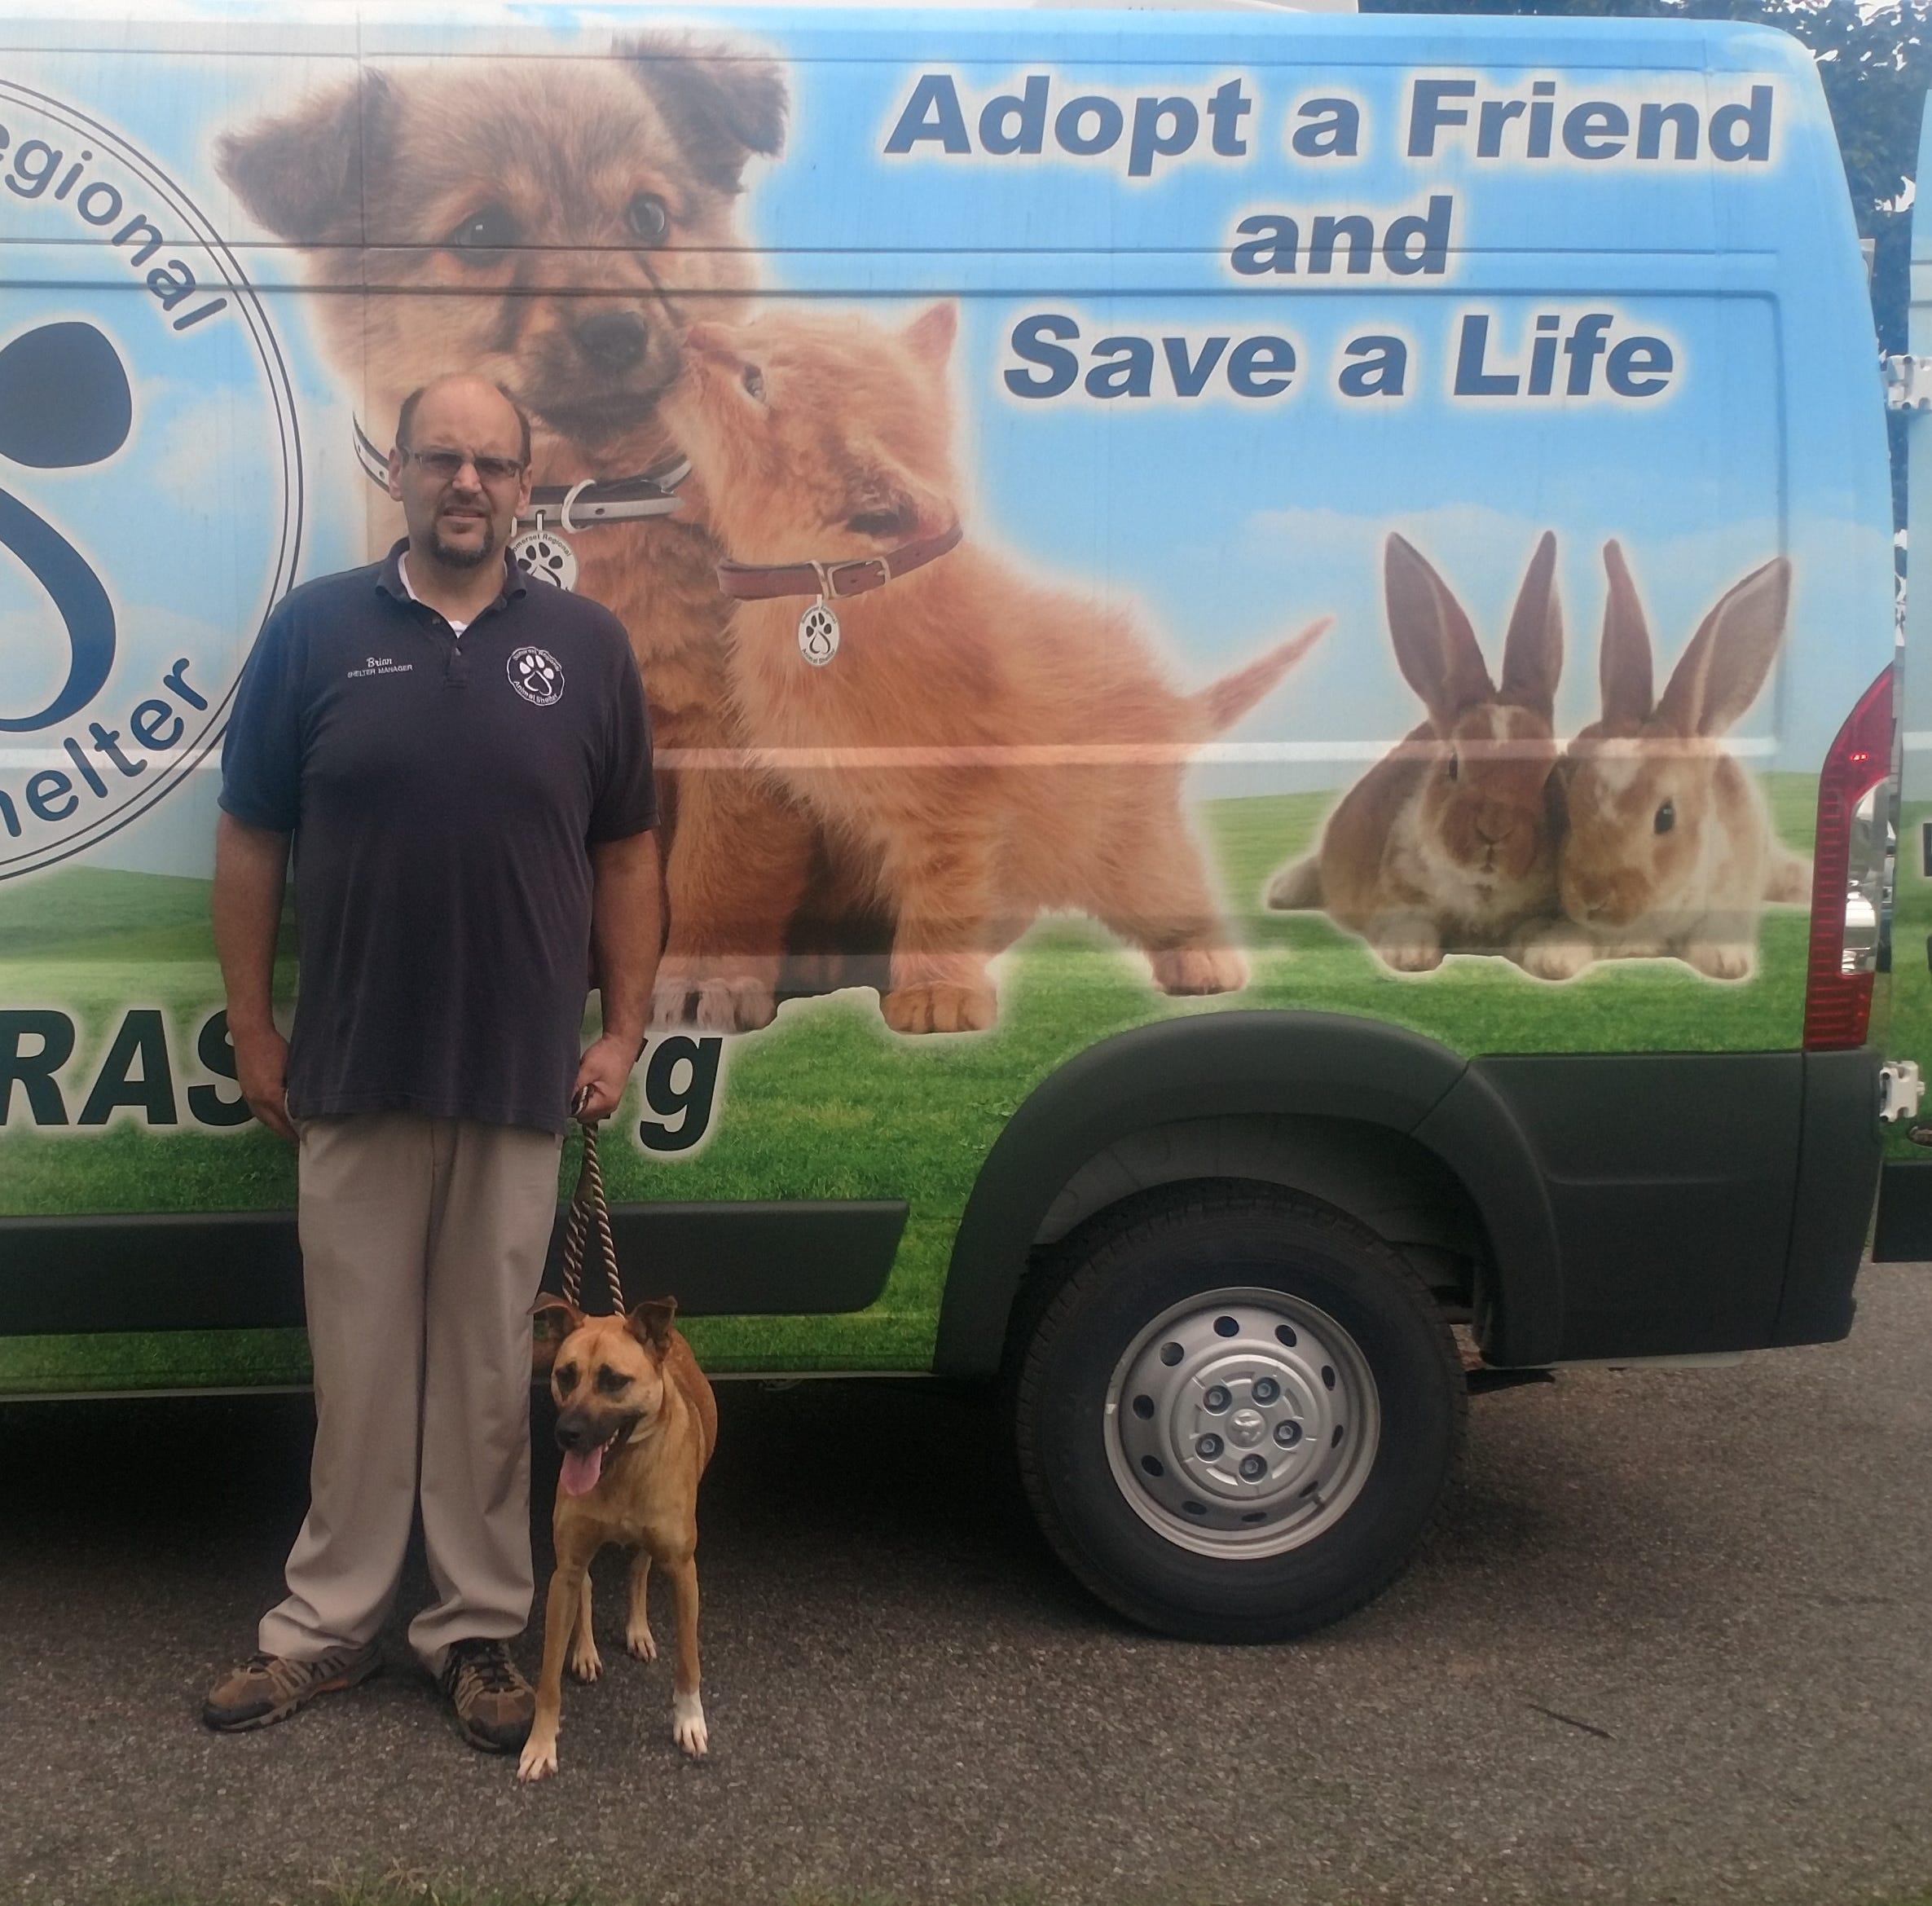 Hurricane Florence: NJ animal shelter rescues first dog from Carolinas